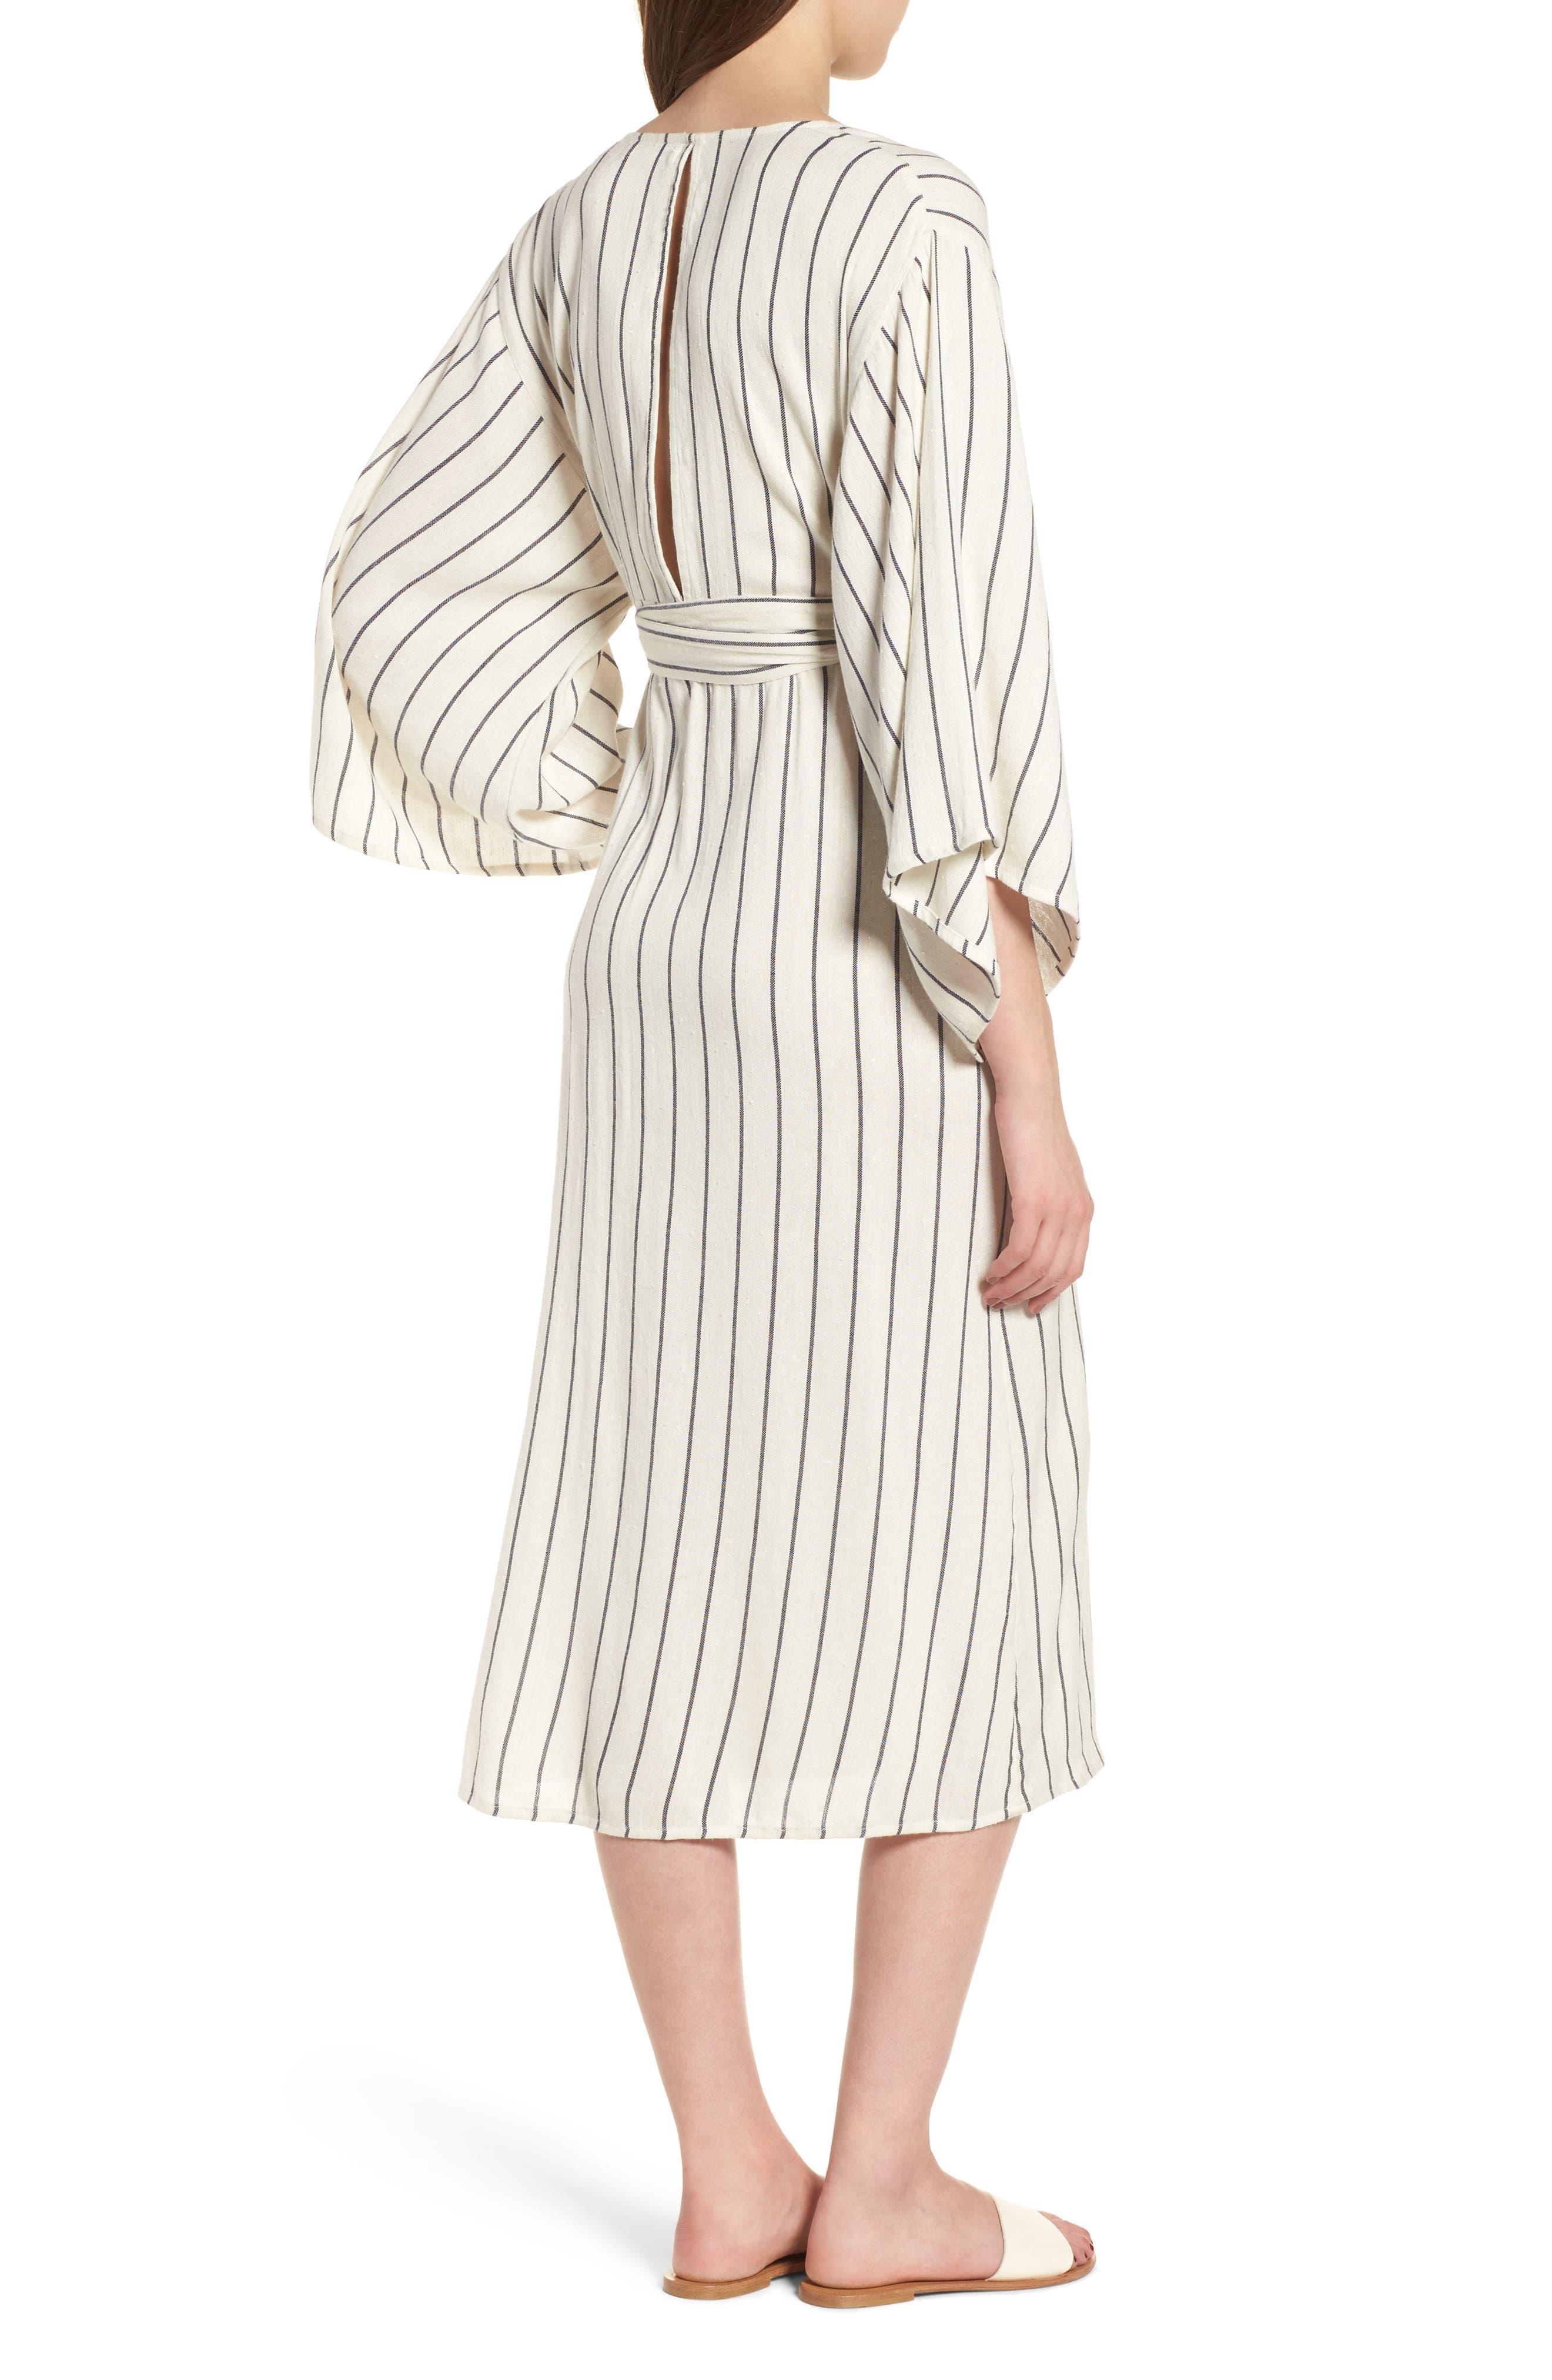 Robe Life Striped Midi Dress,                             Alternate thumbnail 2, color,                             Cool Wip